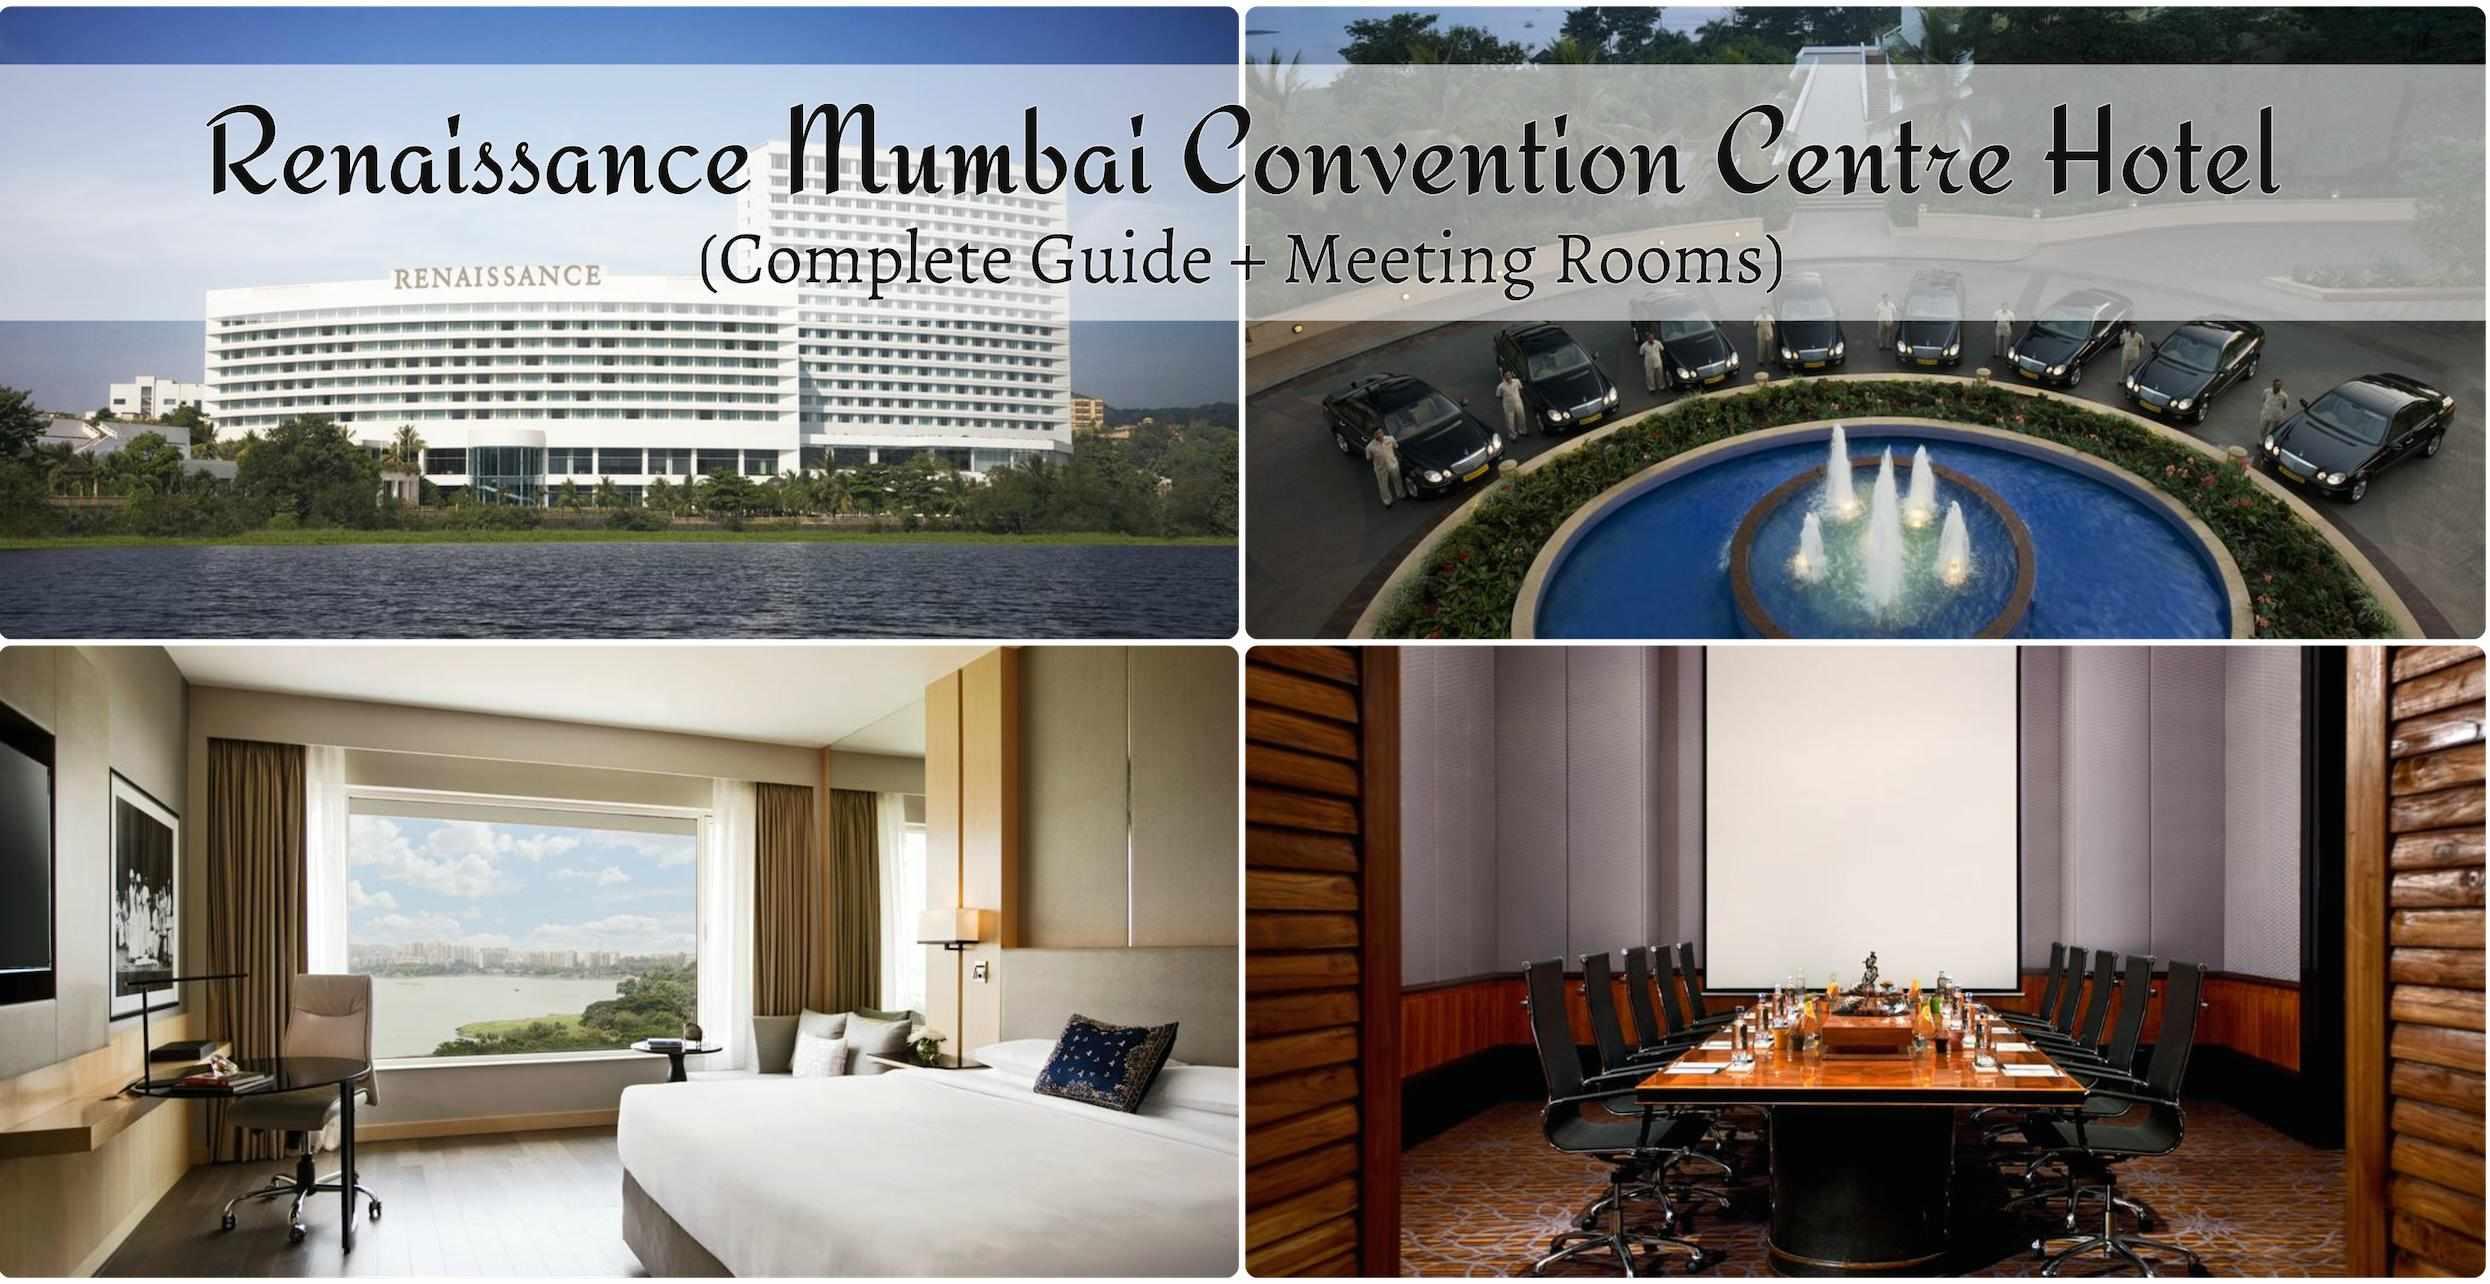 Renaissance-Mumbai-convention-centre-hotel.